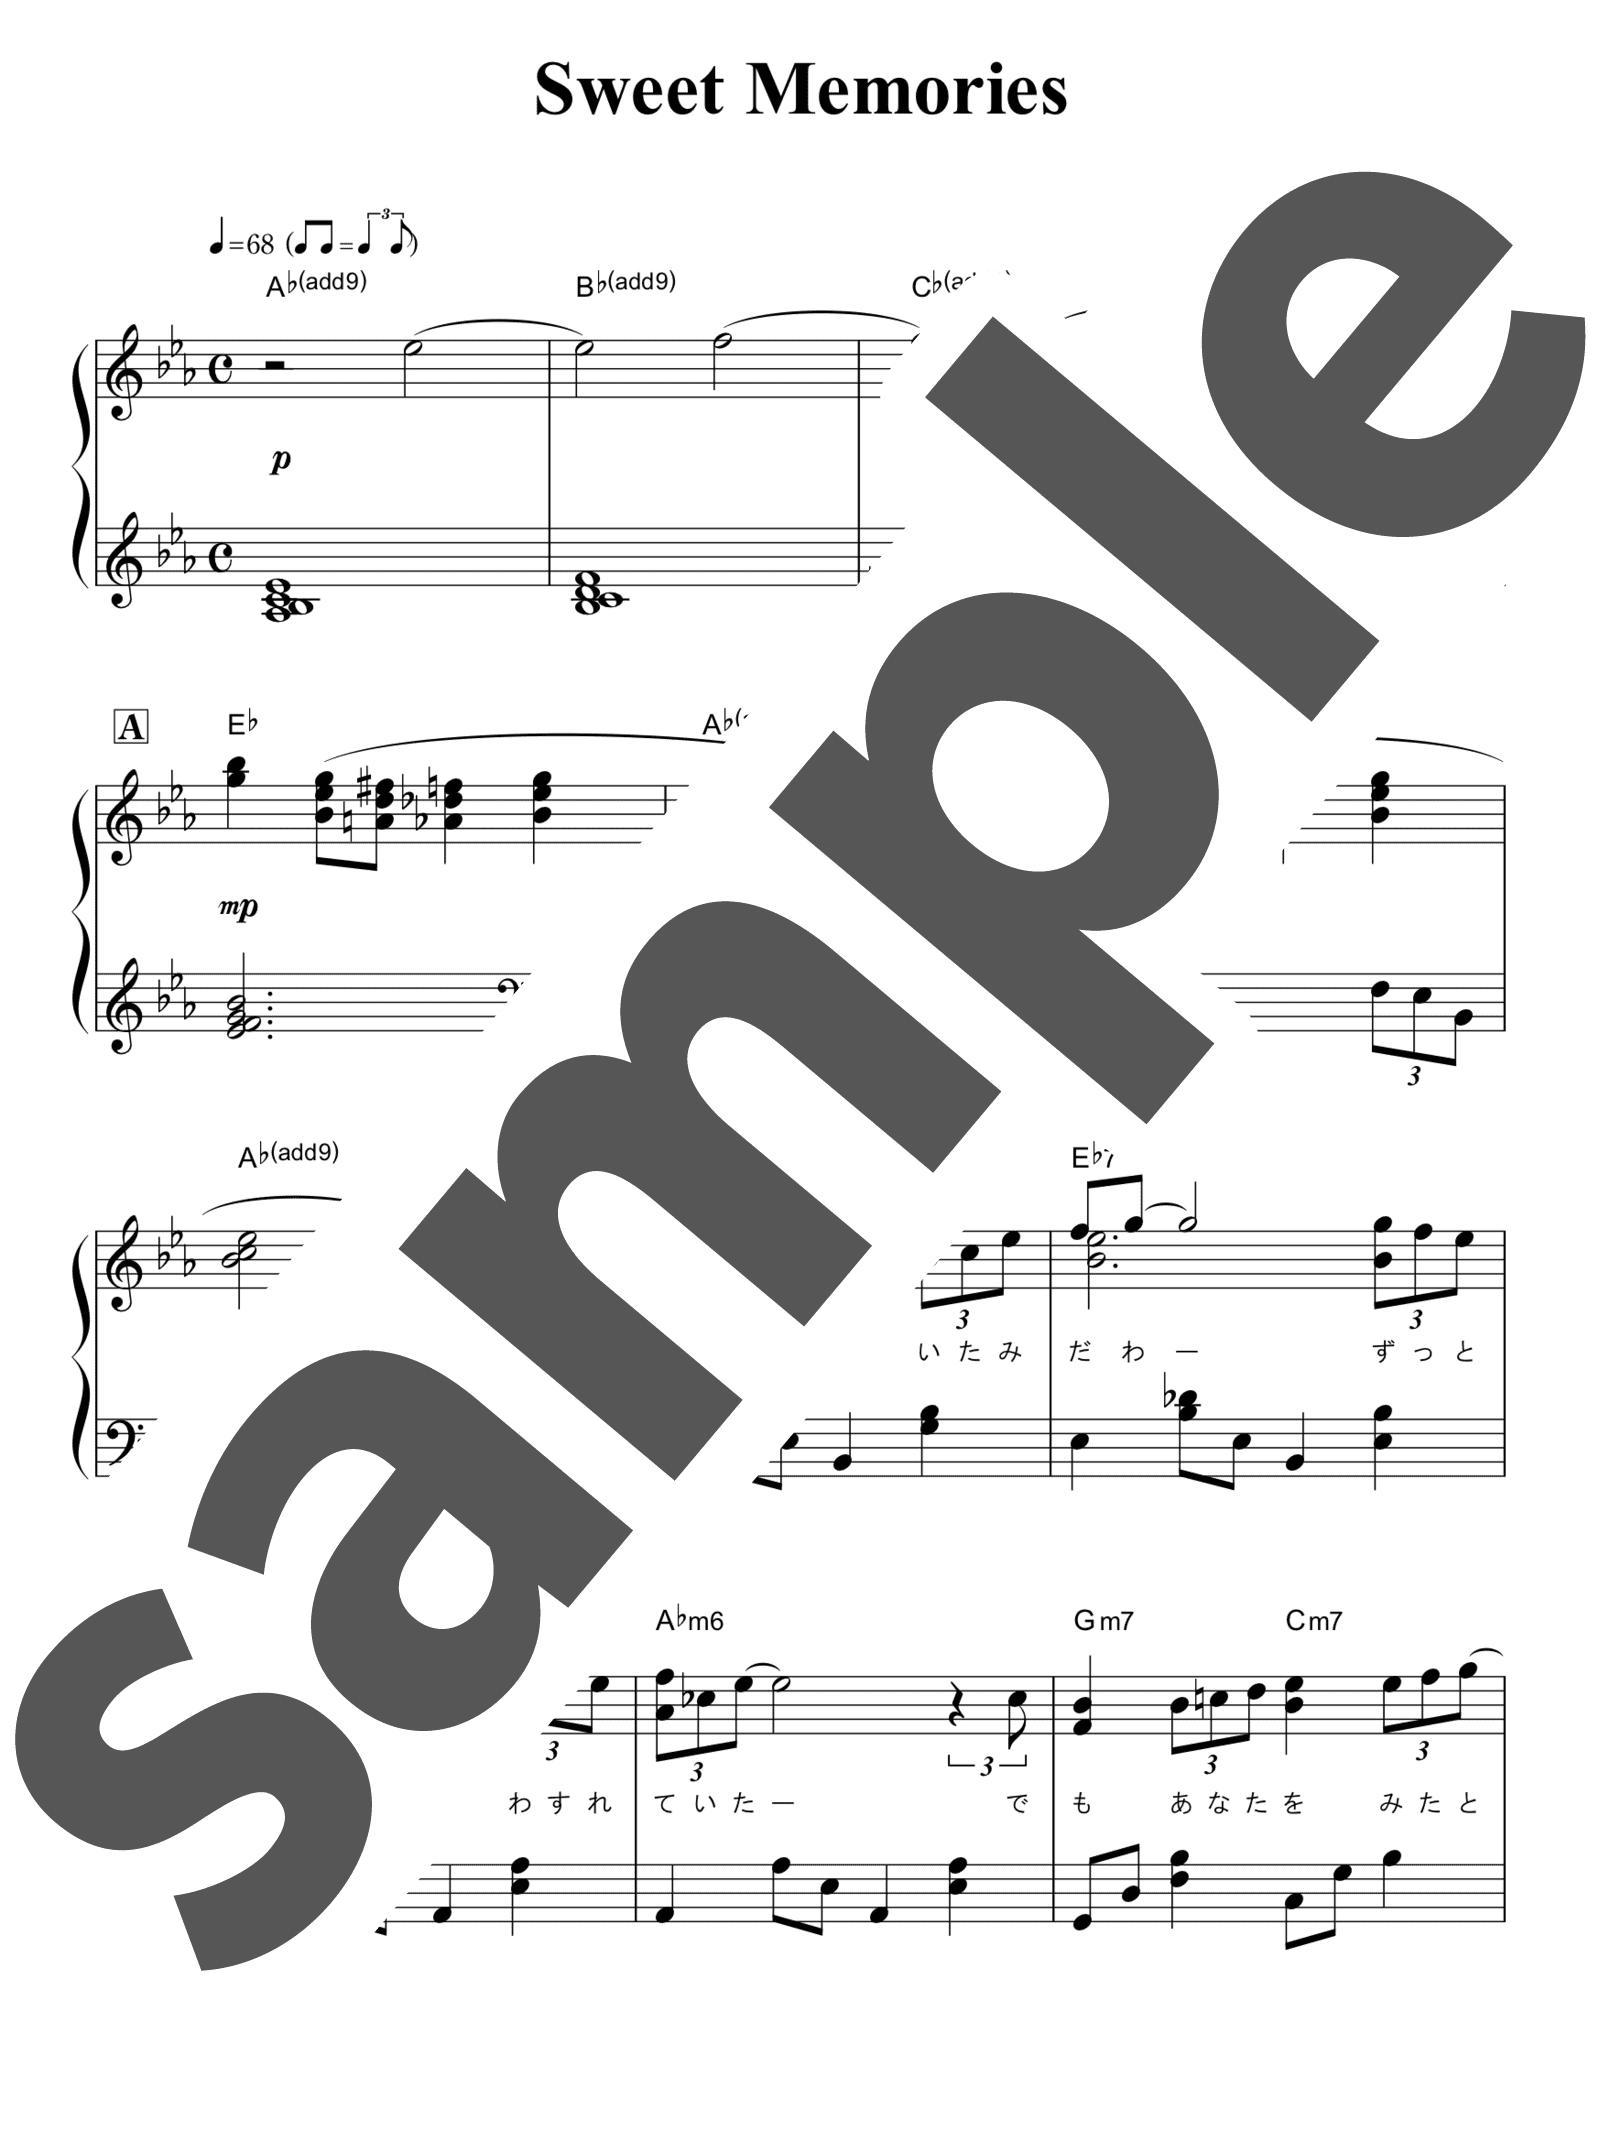 「SWEET MEMORIES」のサンプル楽譜